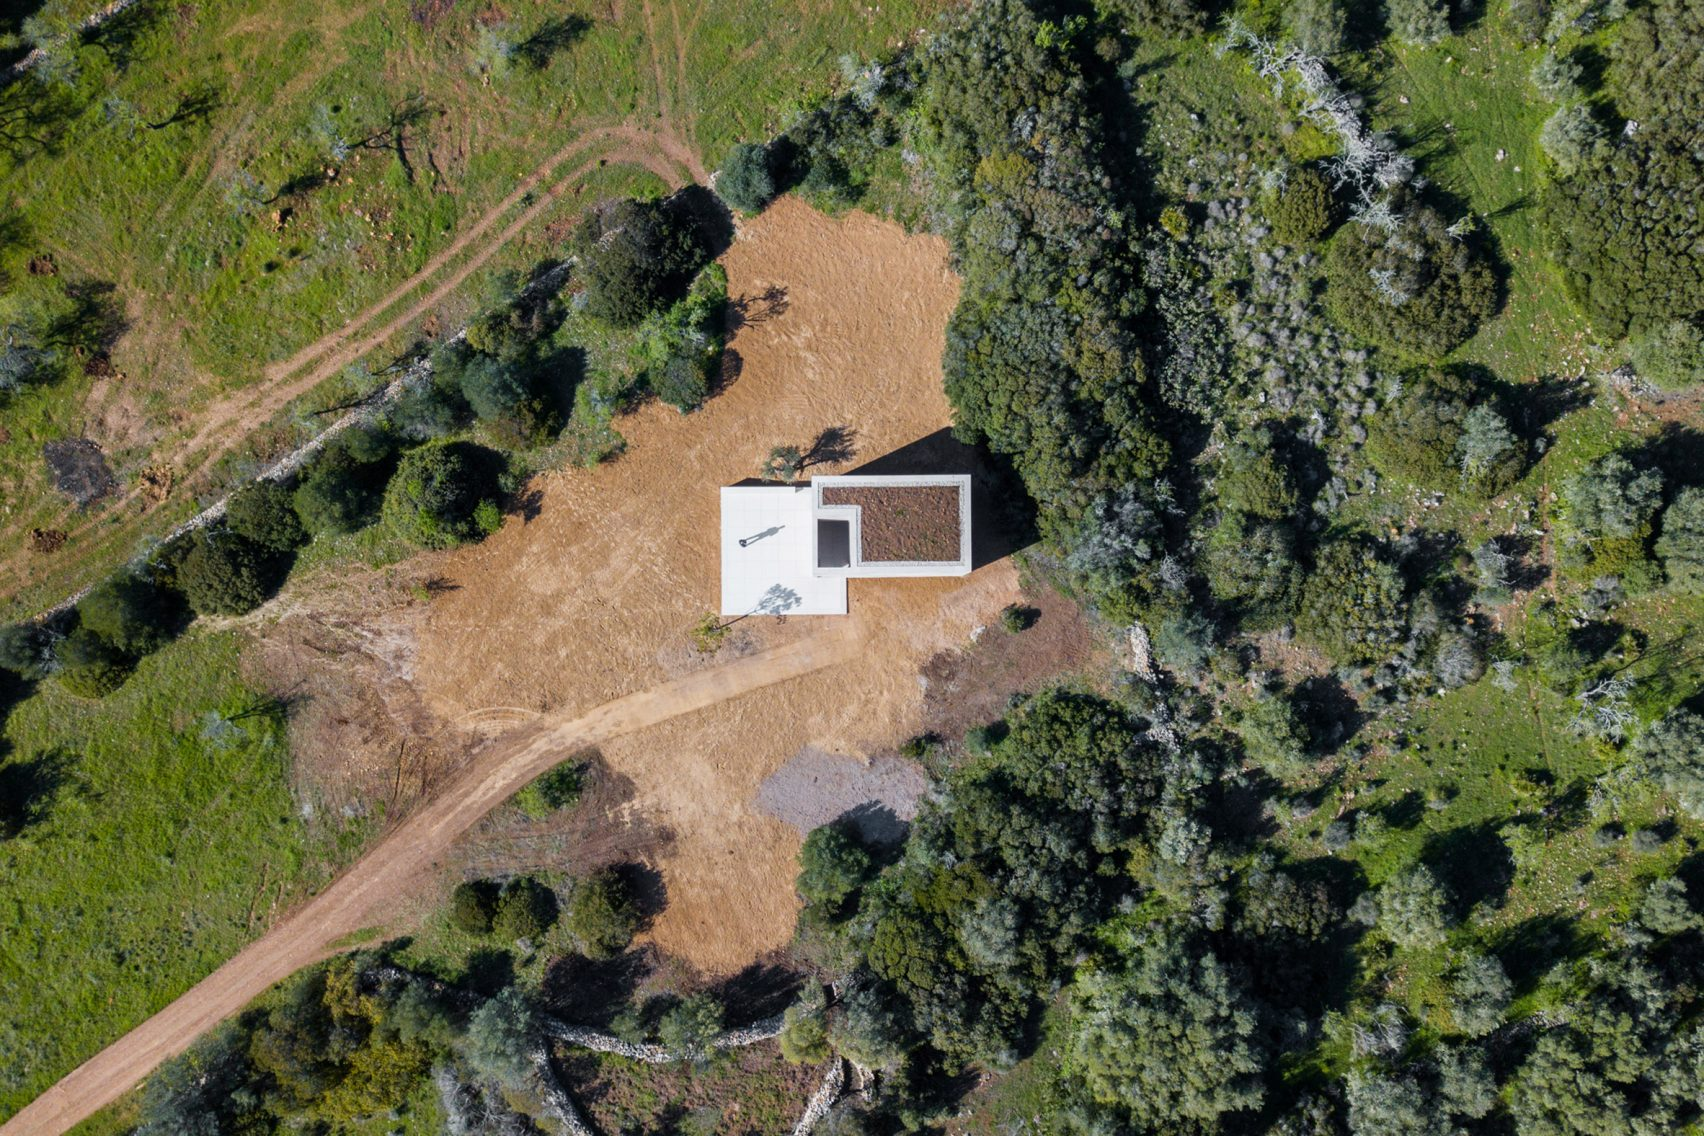 alvaro-siza-viera-capela-do-monte-chapel-algarve_dezeen_2364_col_0-1704x1136